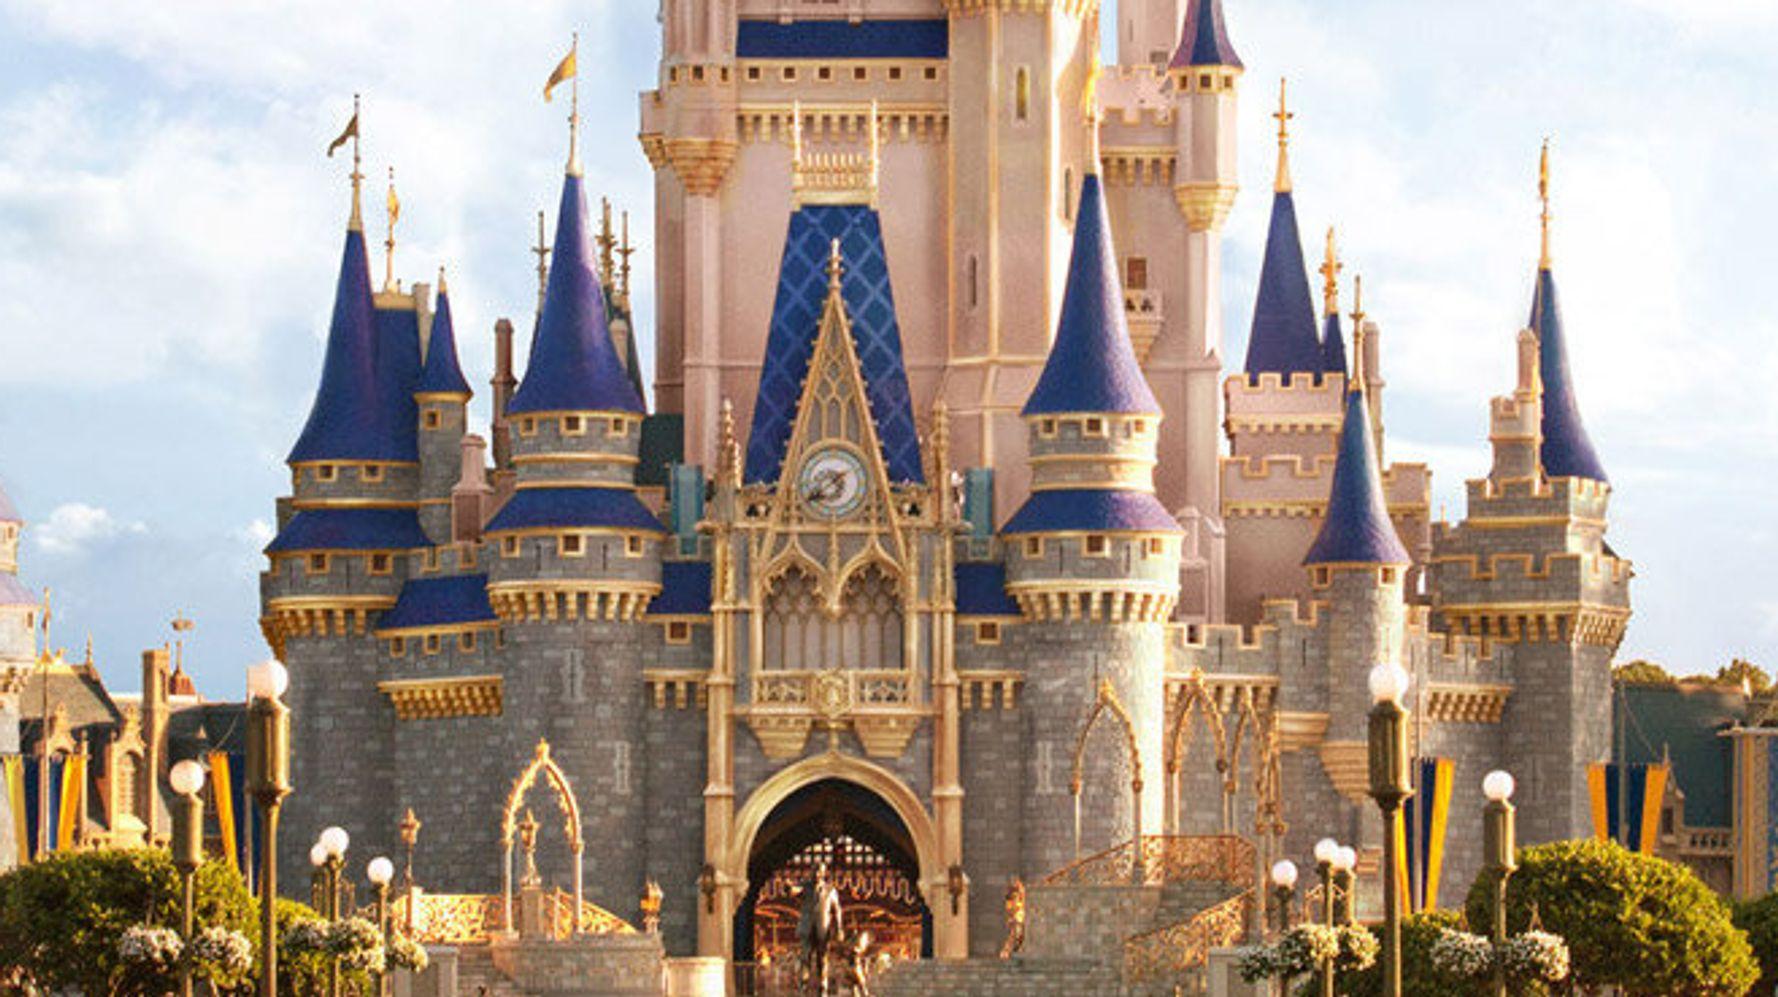 Disney World's Cinderella Castle Is Getting A Major Makeover